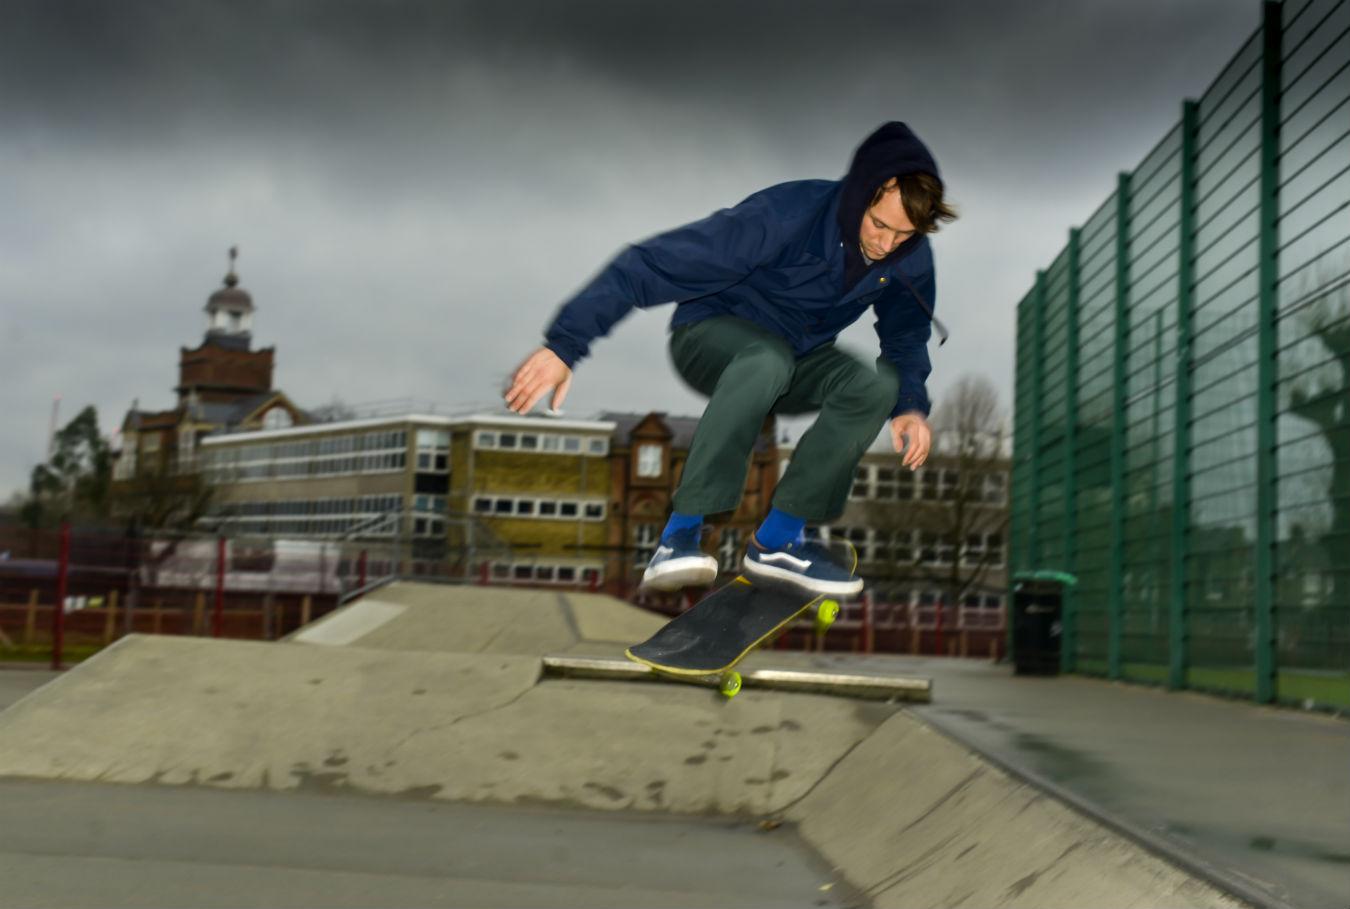 Tara Gordon's photograph of Felix at Camden Road's skate park